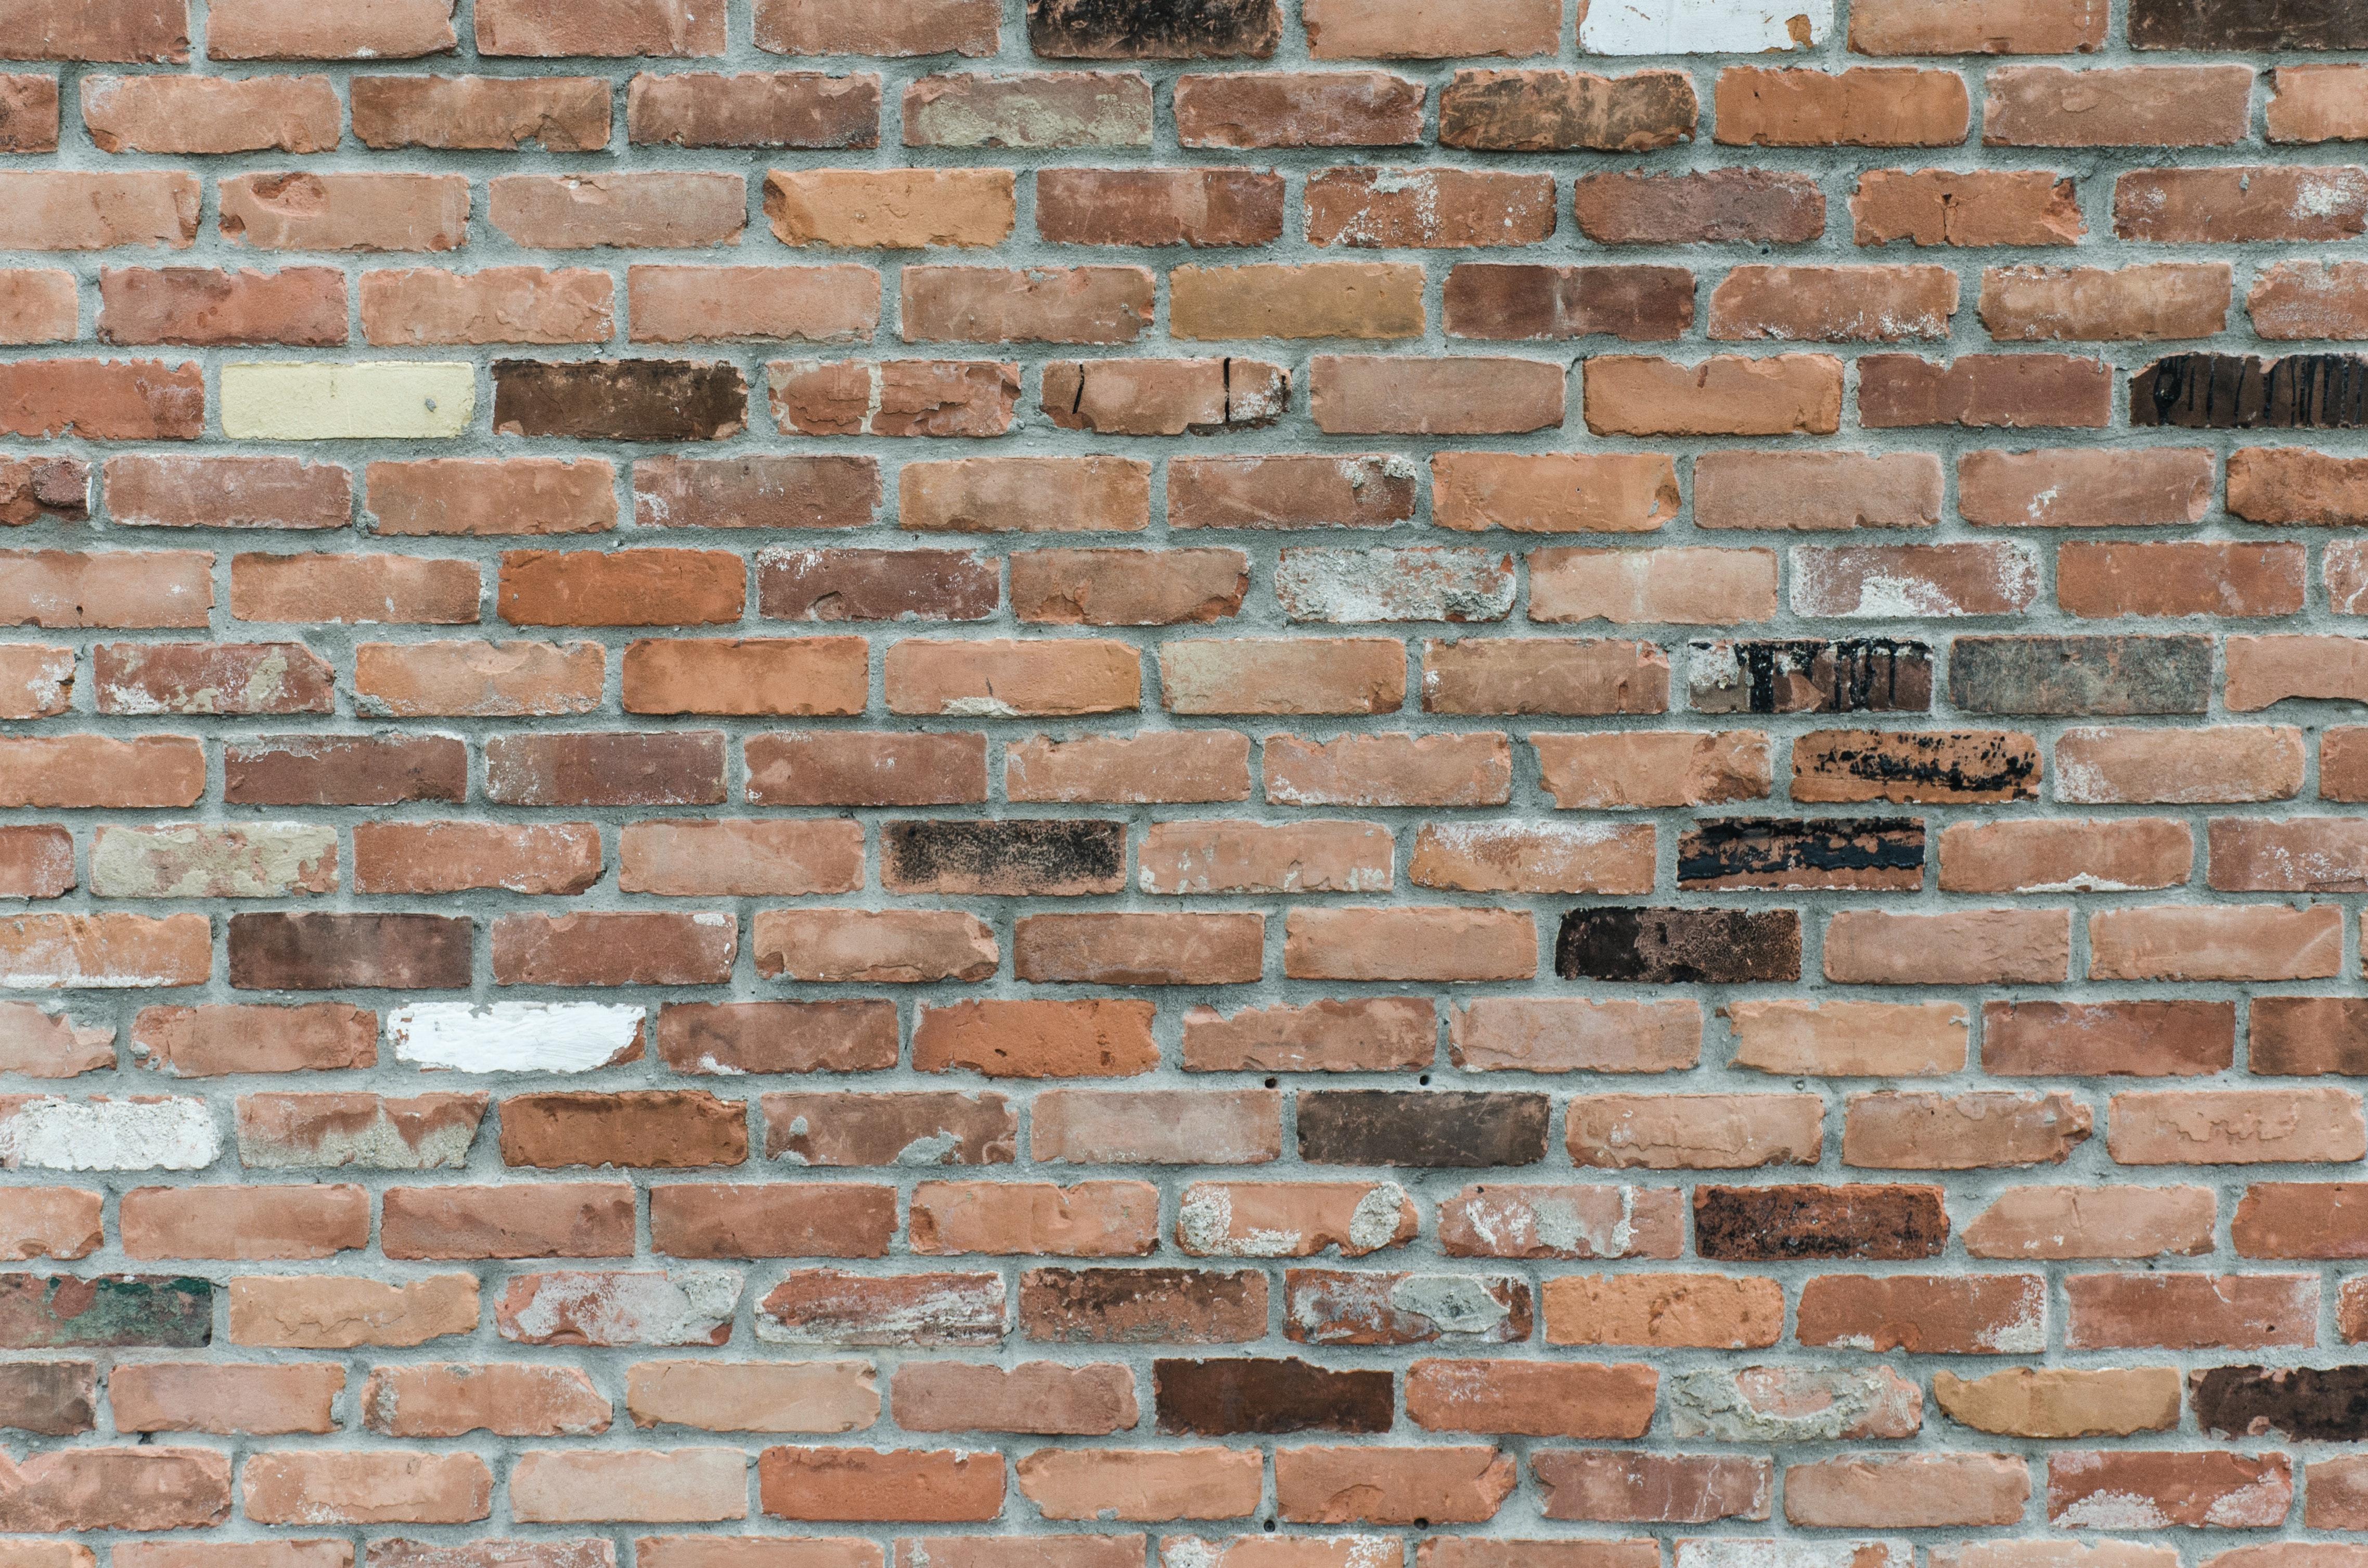 Blacksplash 1000 Interesting Brick Wall Photos 183 Pexels 183 Free Stock